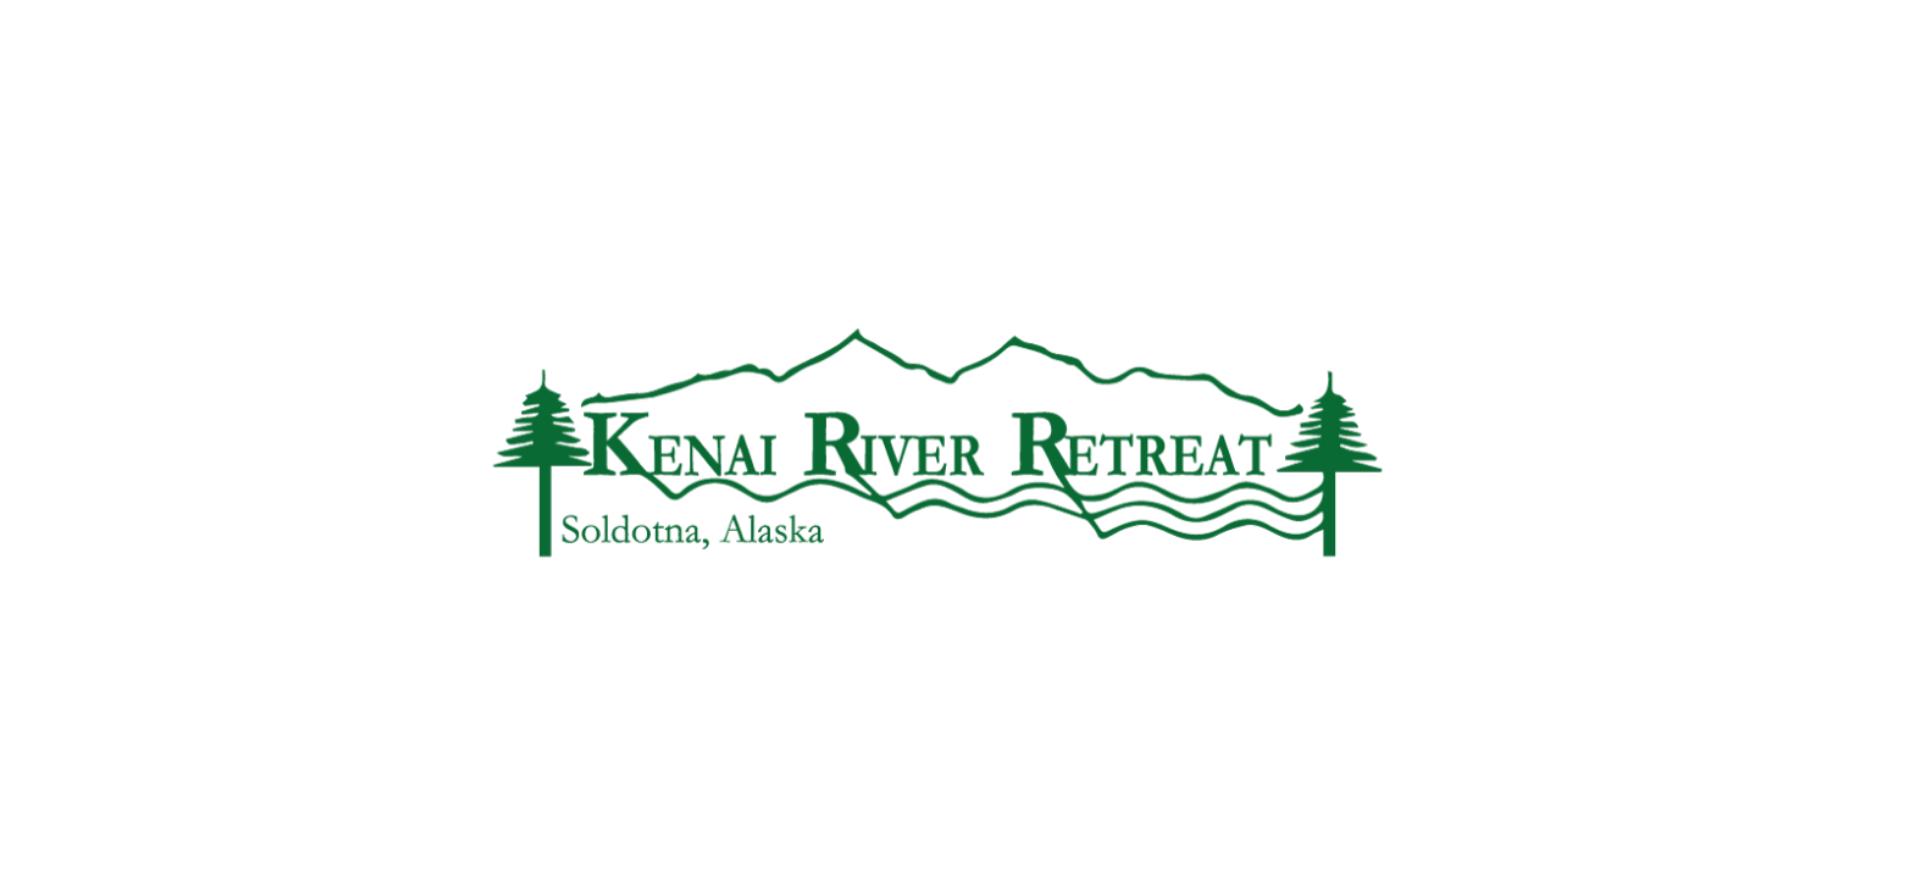 Kenai River Retreat